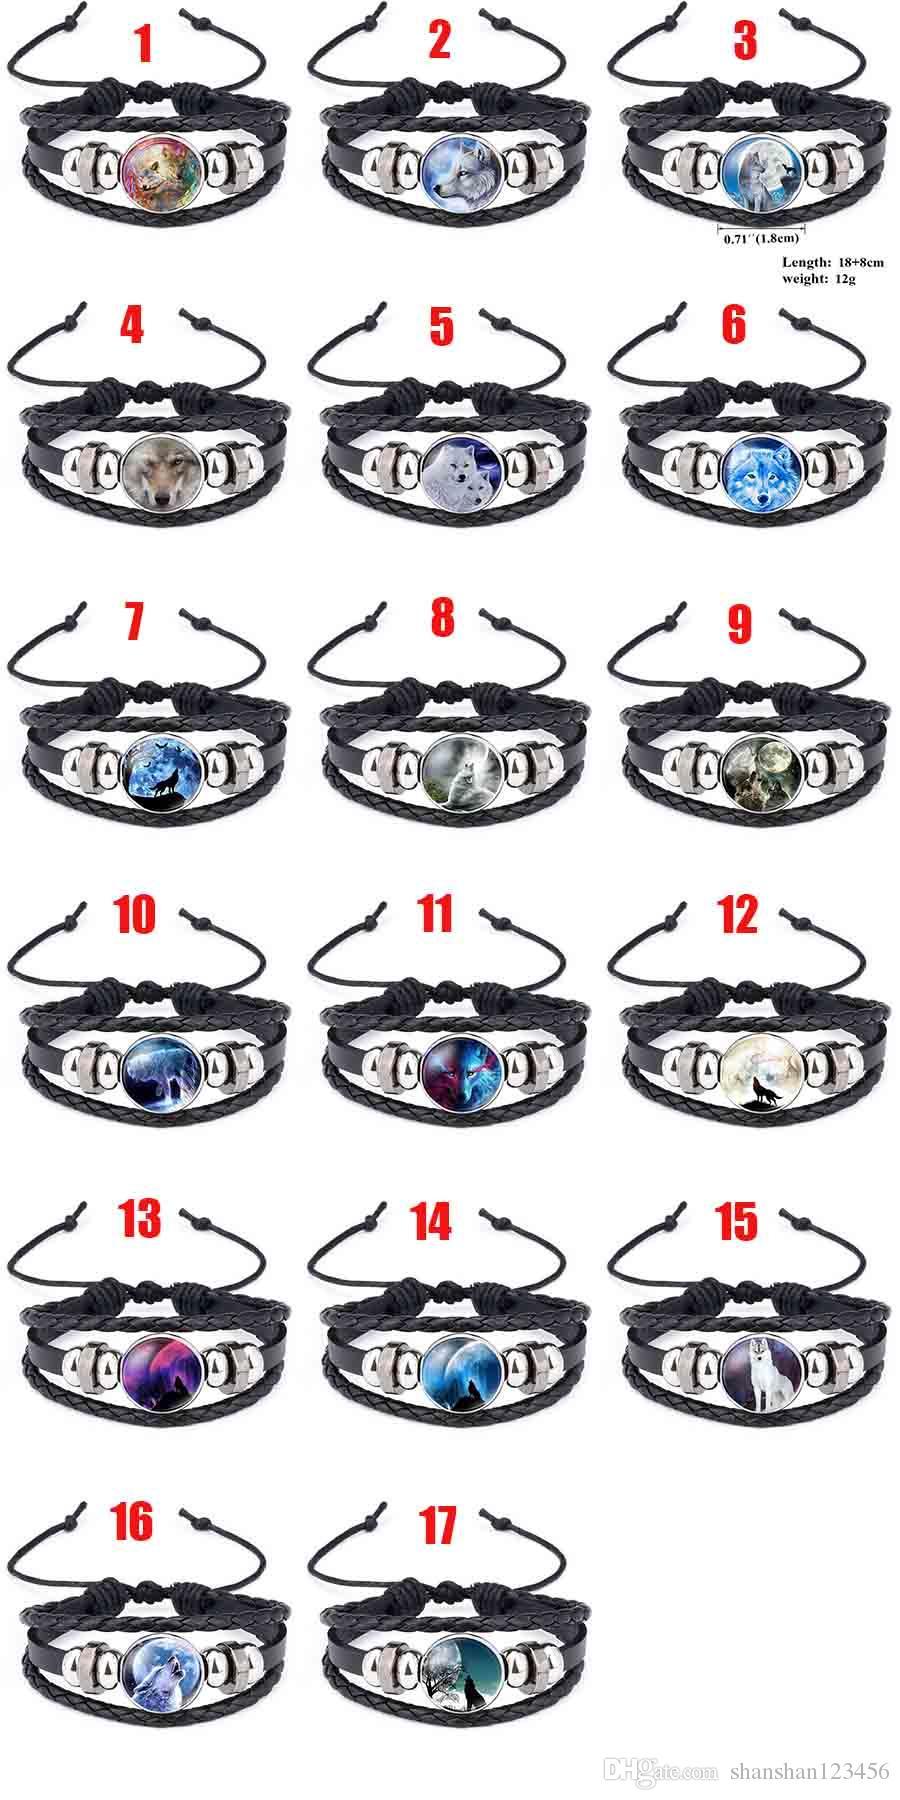 Moon Wolf Howling Handmade Glass Cabochon Woven Leather Bangles Mens Black Cool Punk Animal Bracelet Jewelry Moonlight Gemstone 320054